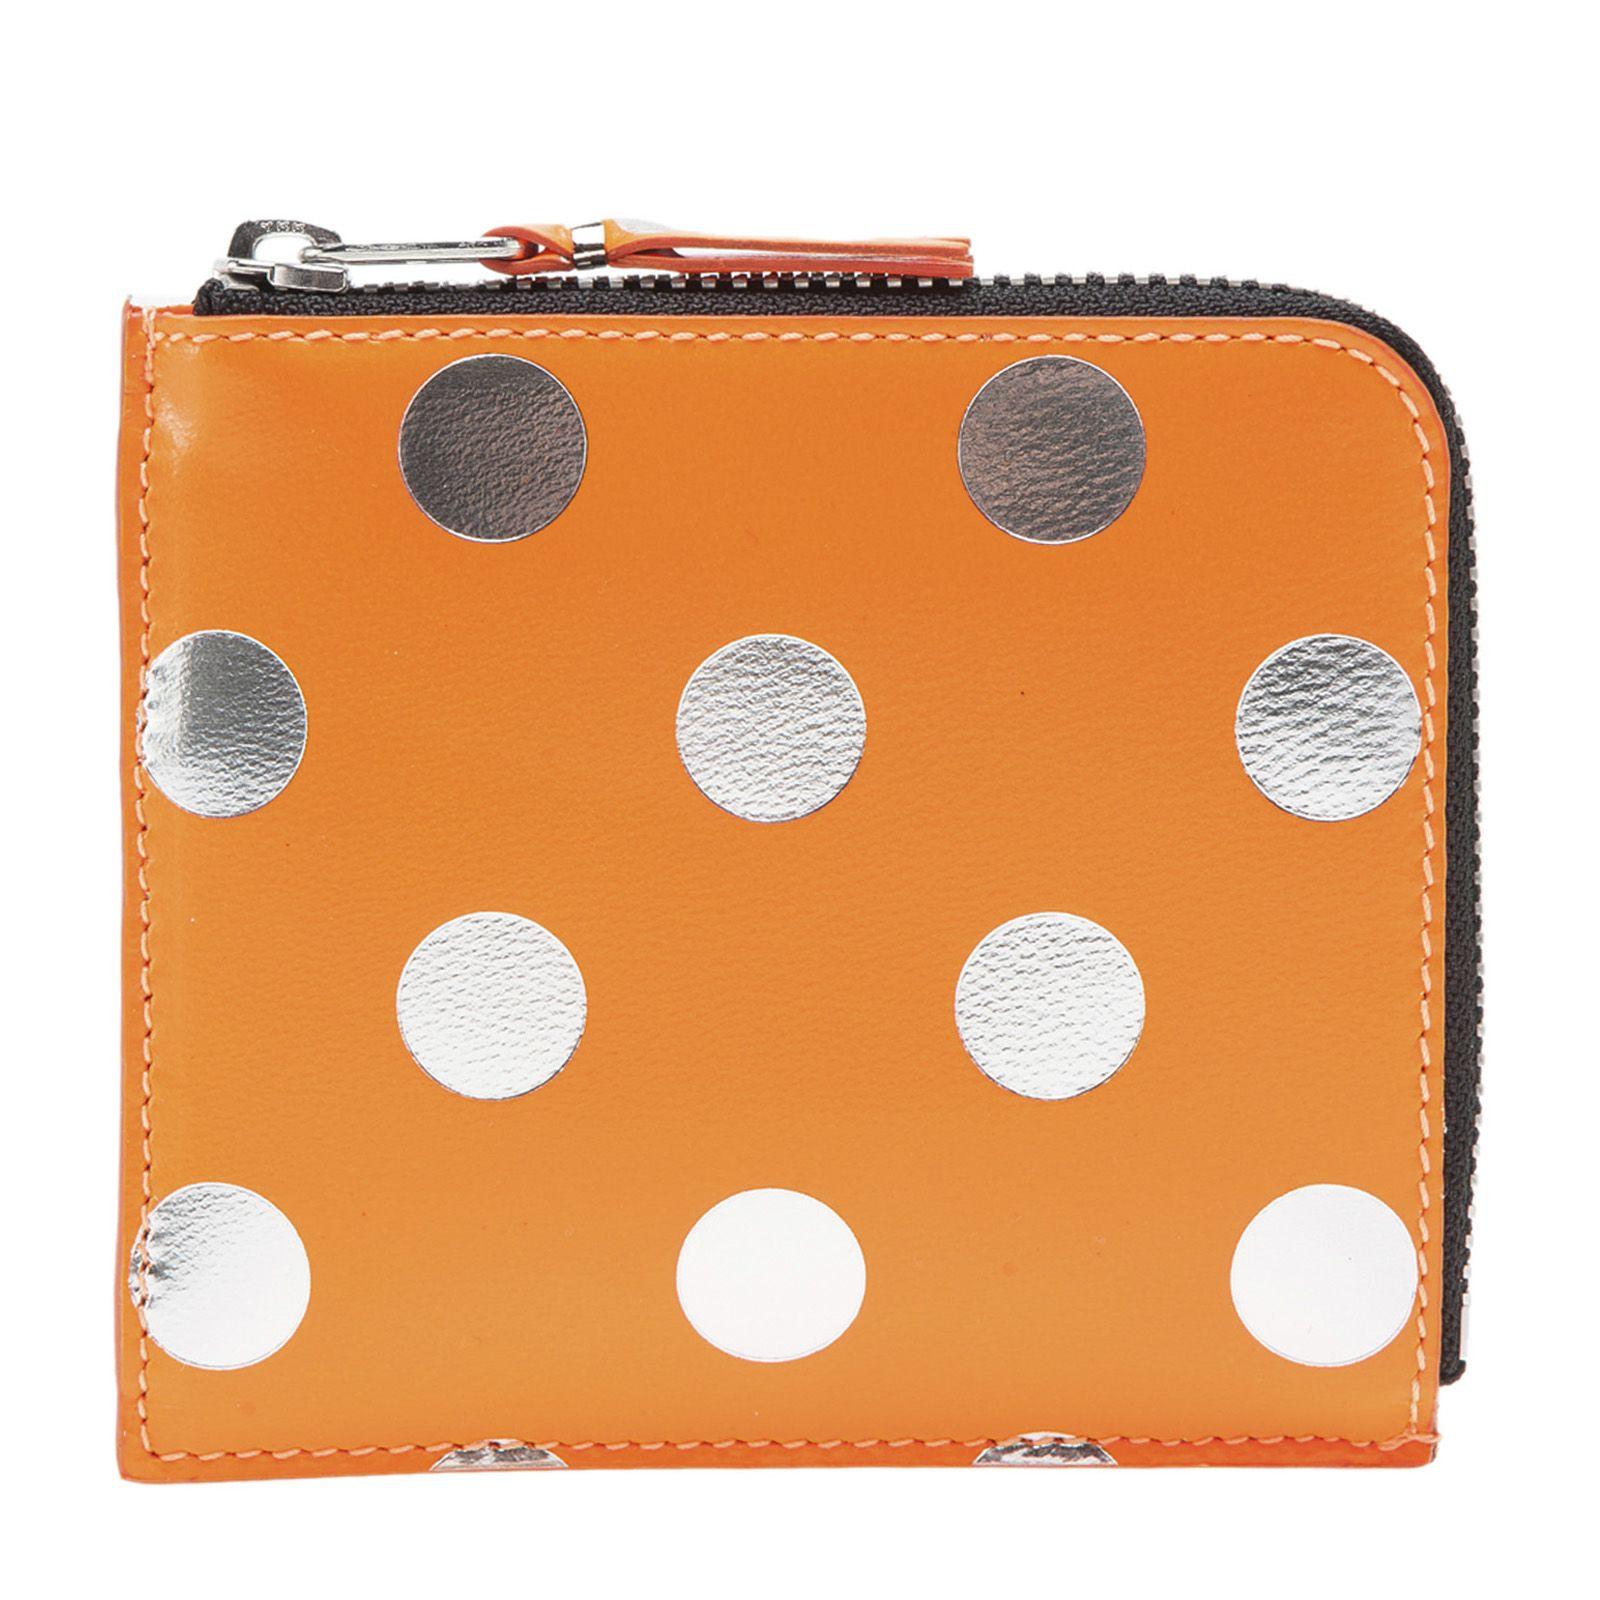 Comme Des Garçons Wallet Polka Dot Small Wallet